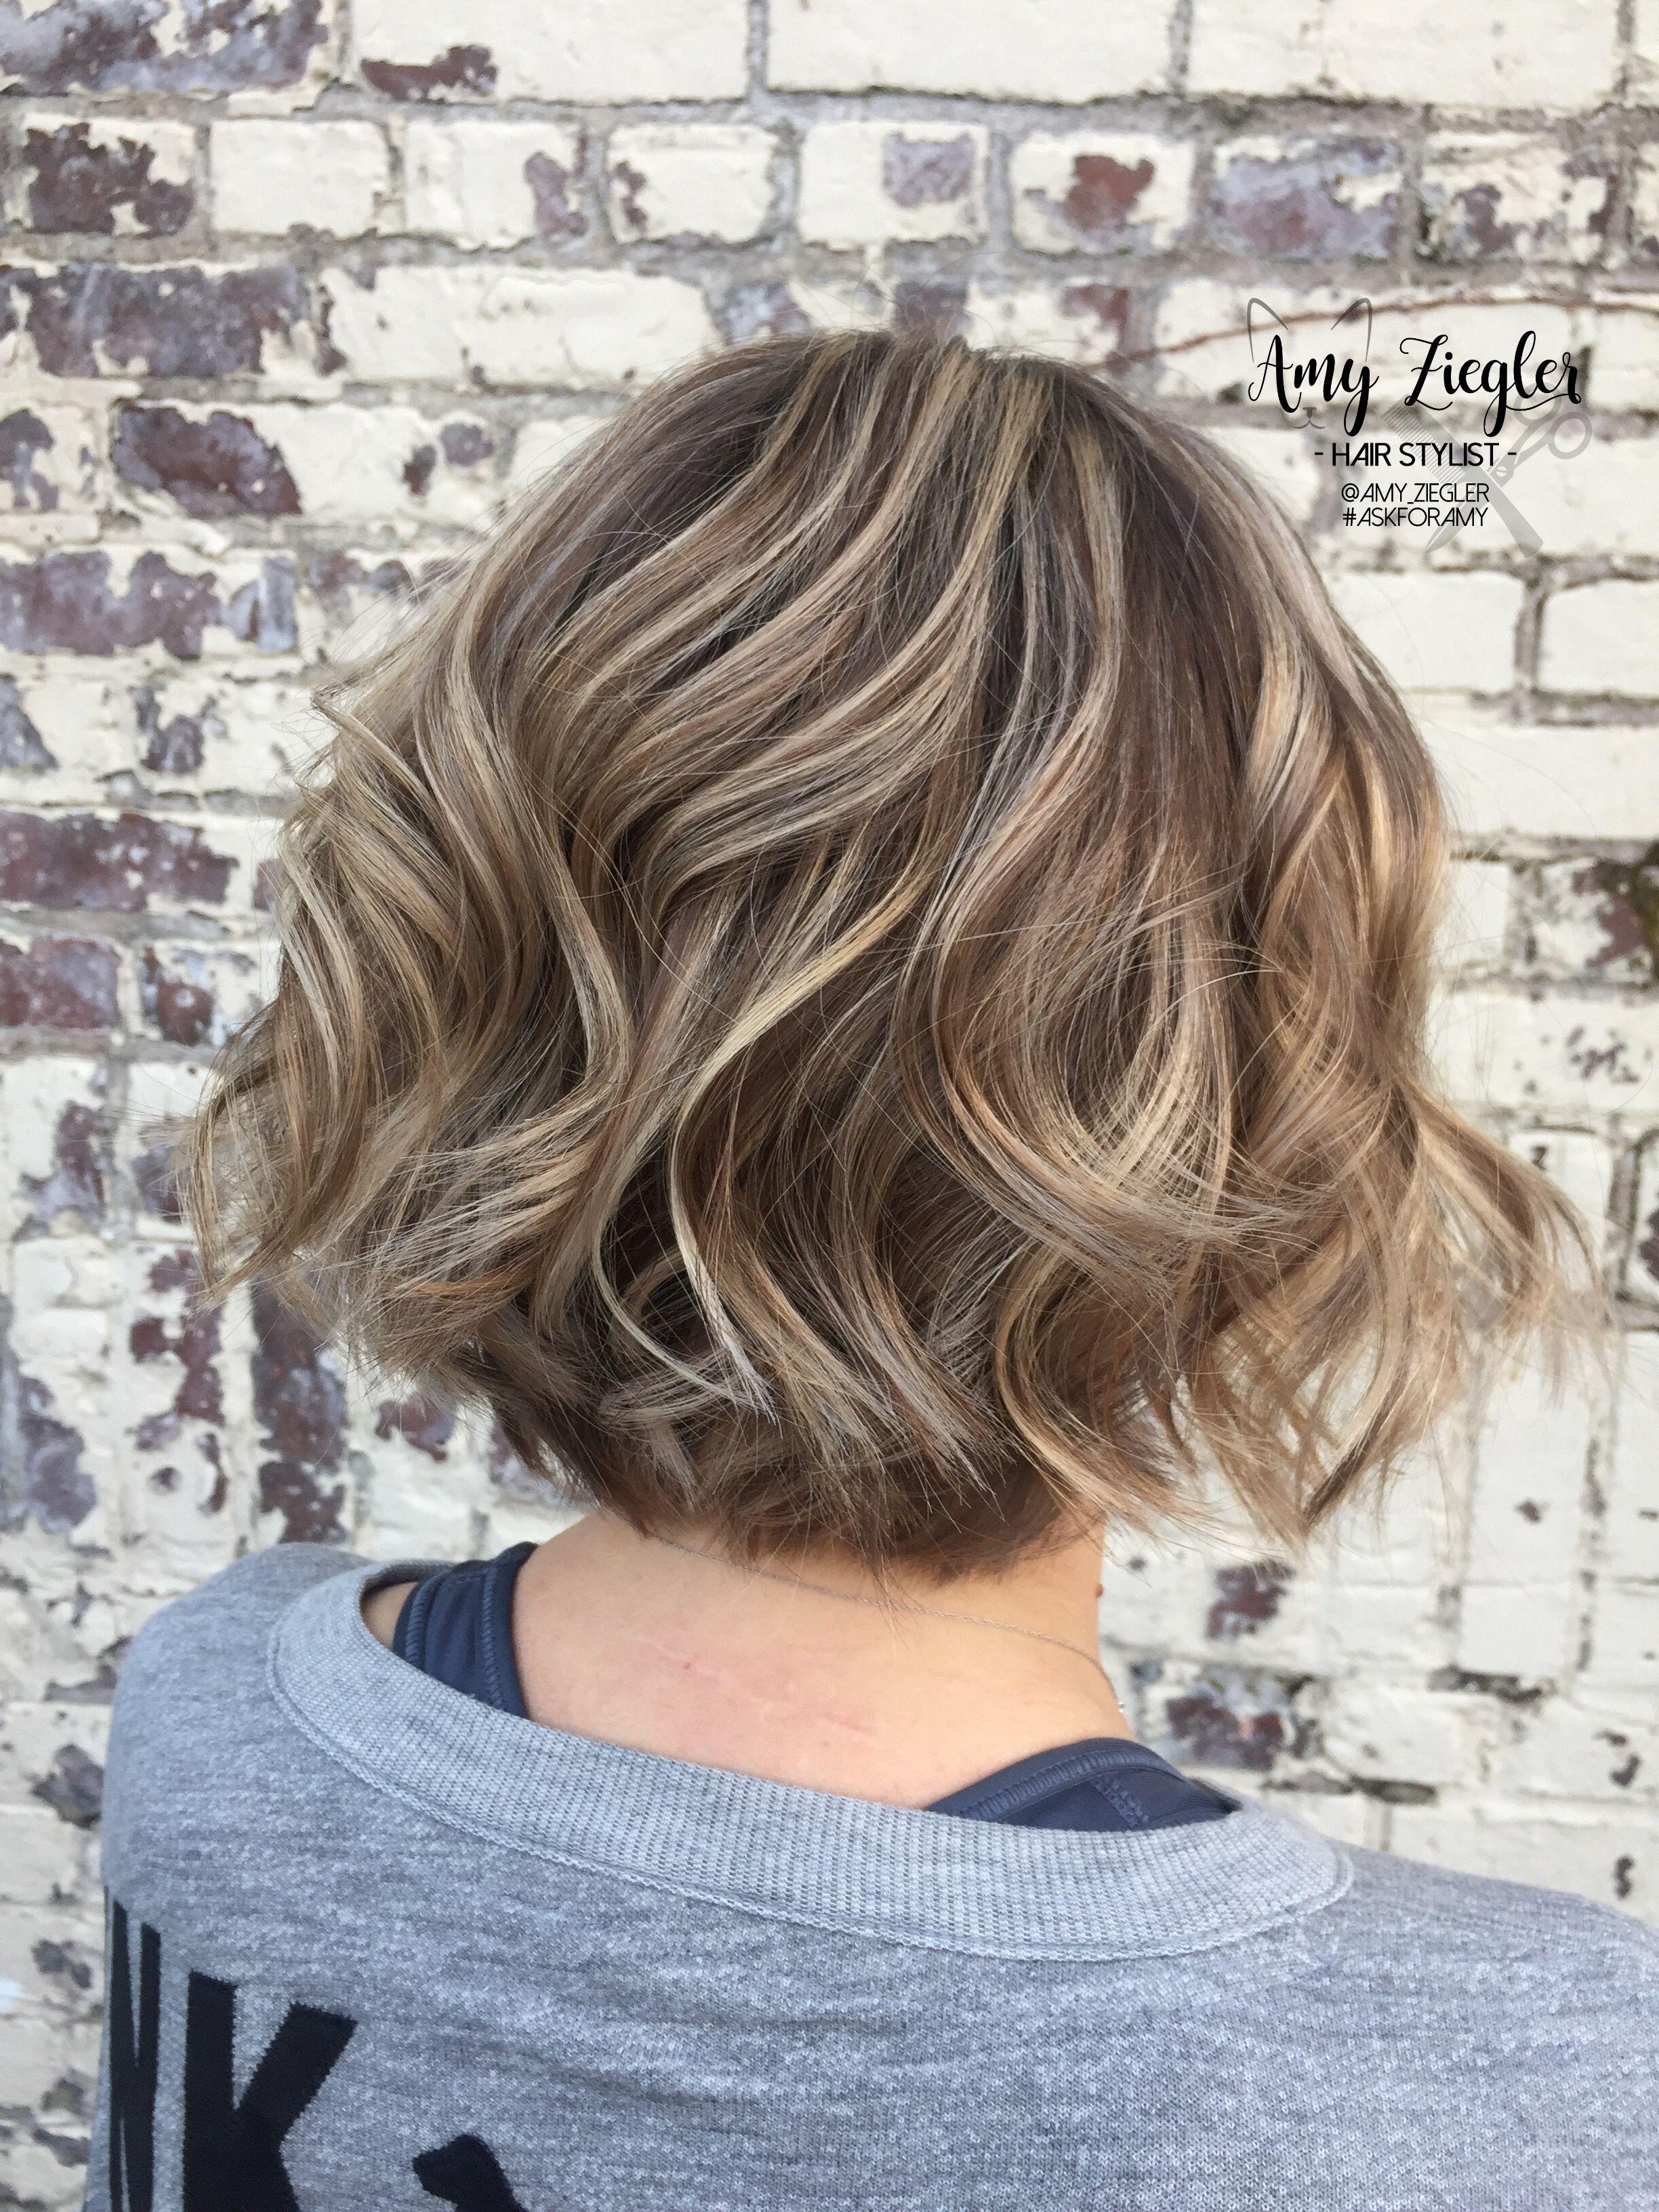 Blonde Highlight Lowlight And Short Textured Bob By Amy Ziegler